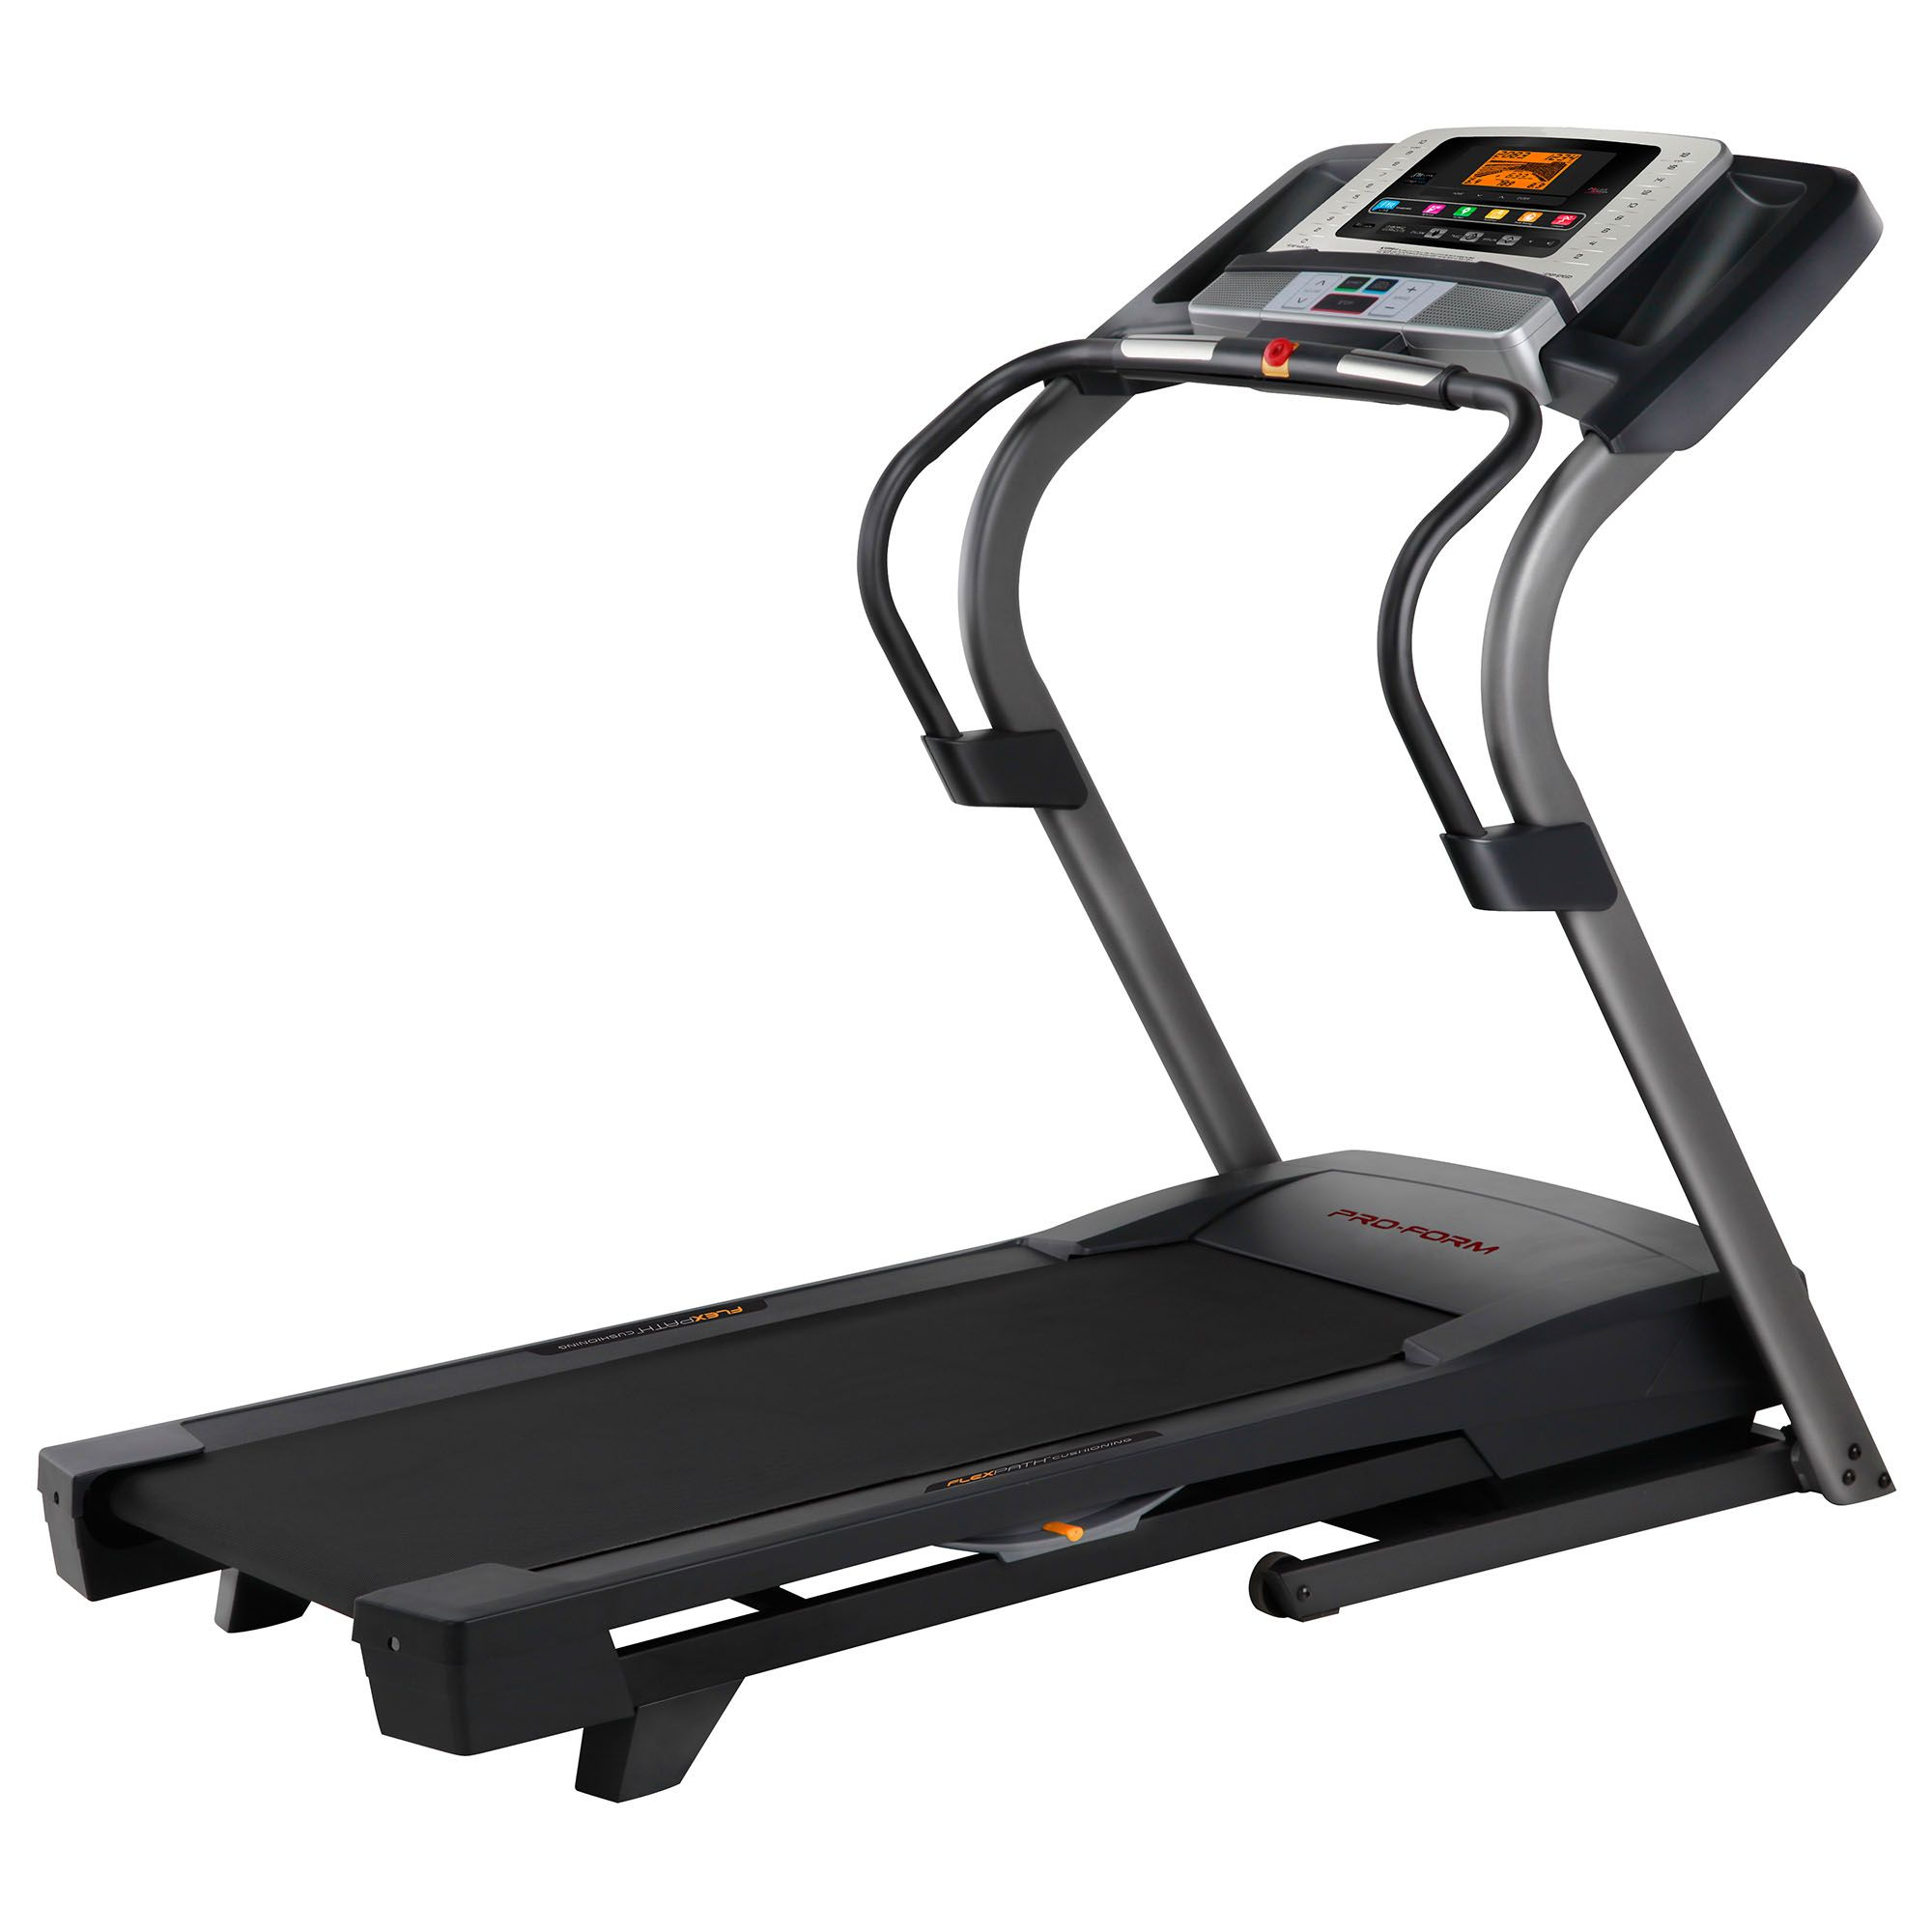 proform 710 zlt treadmill sweatbandcom With tapis de course pro form